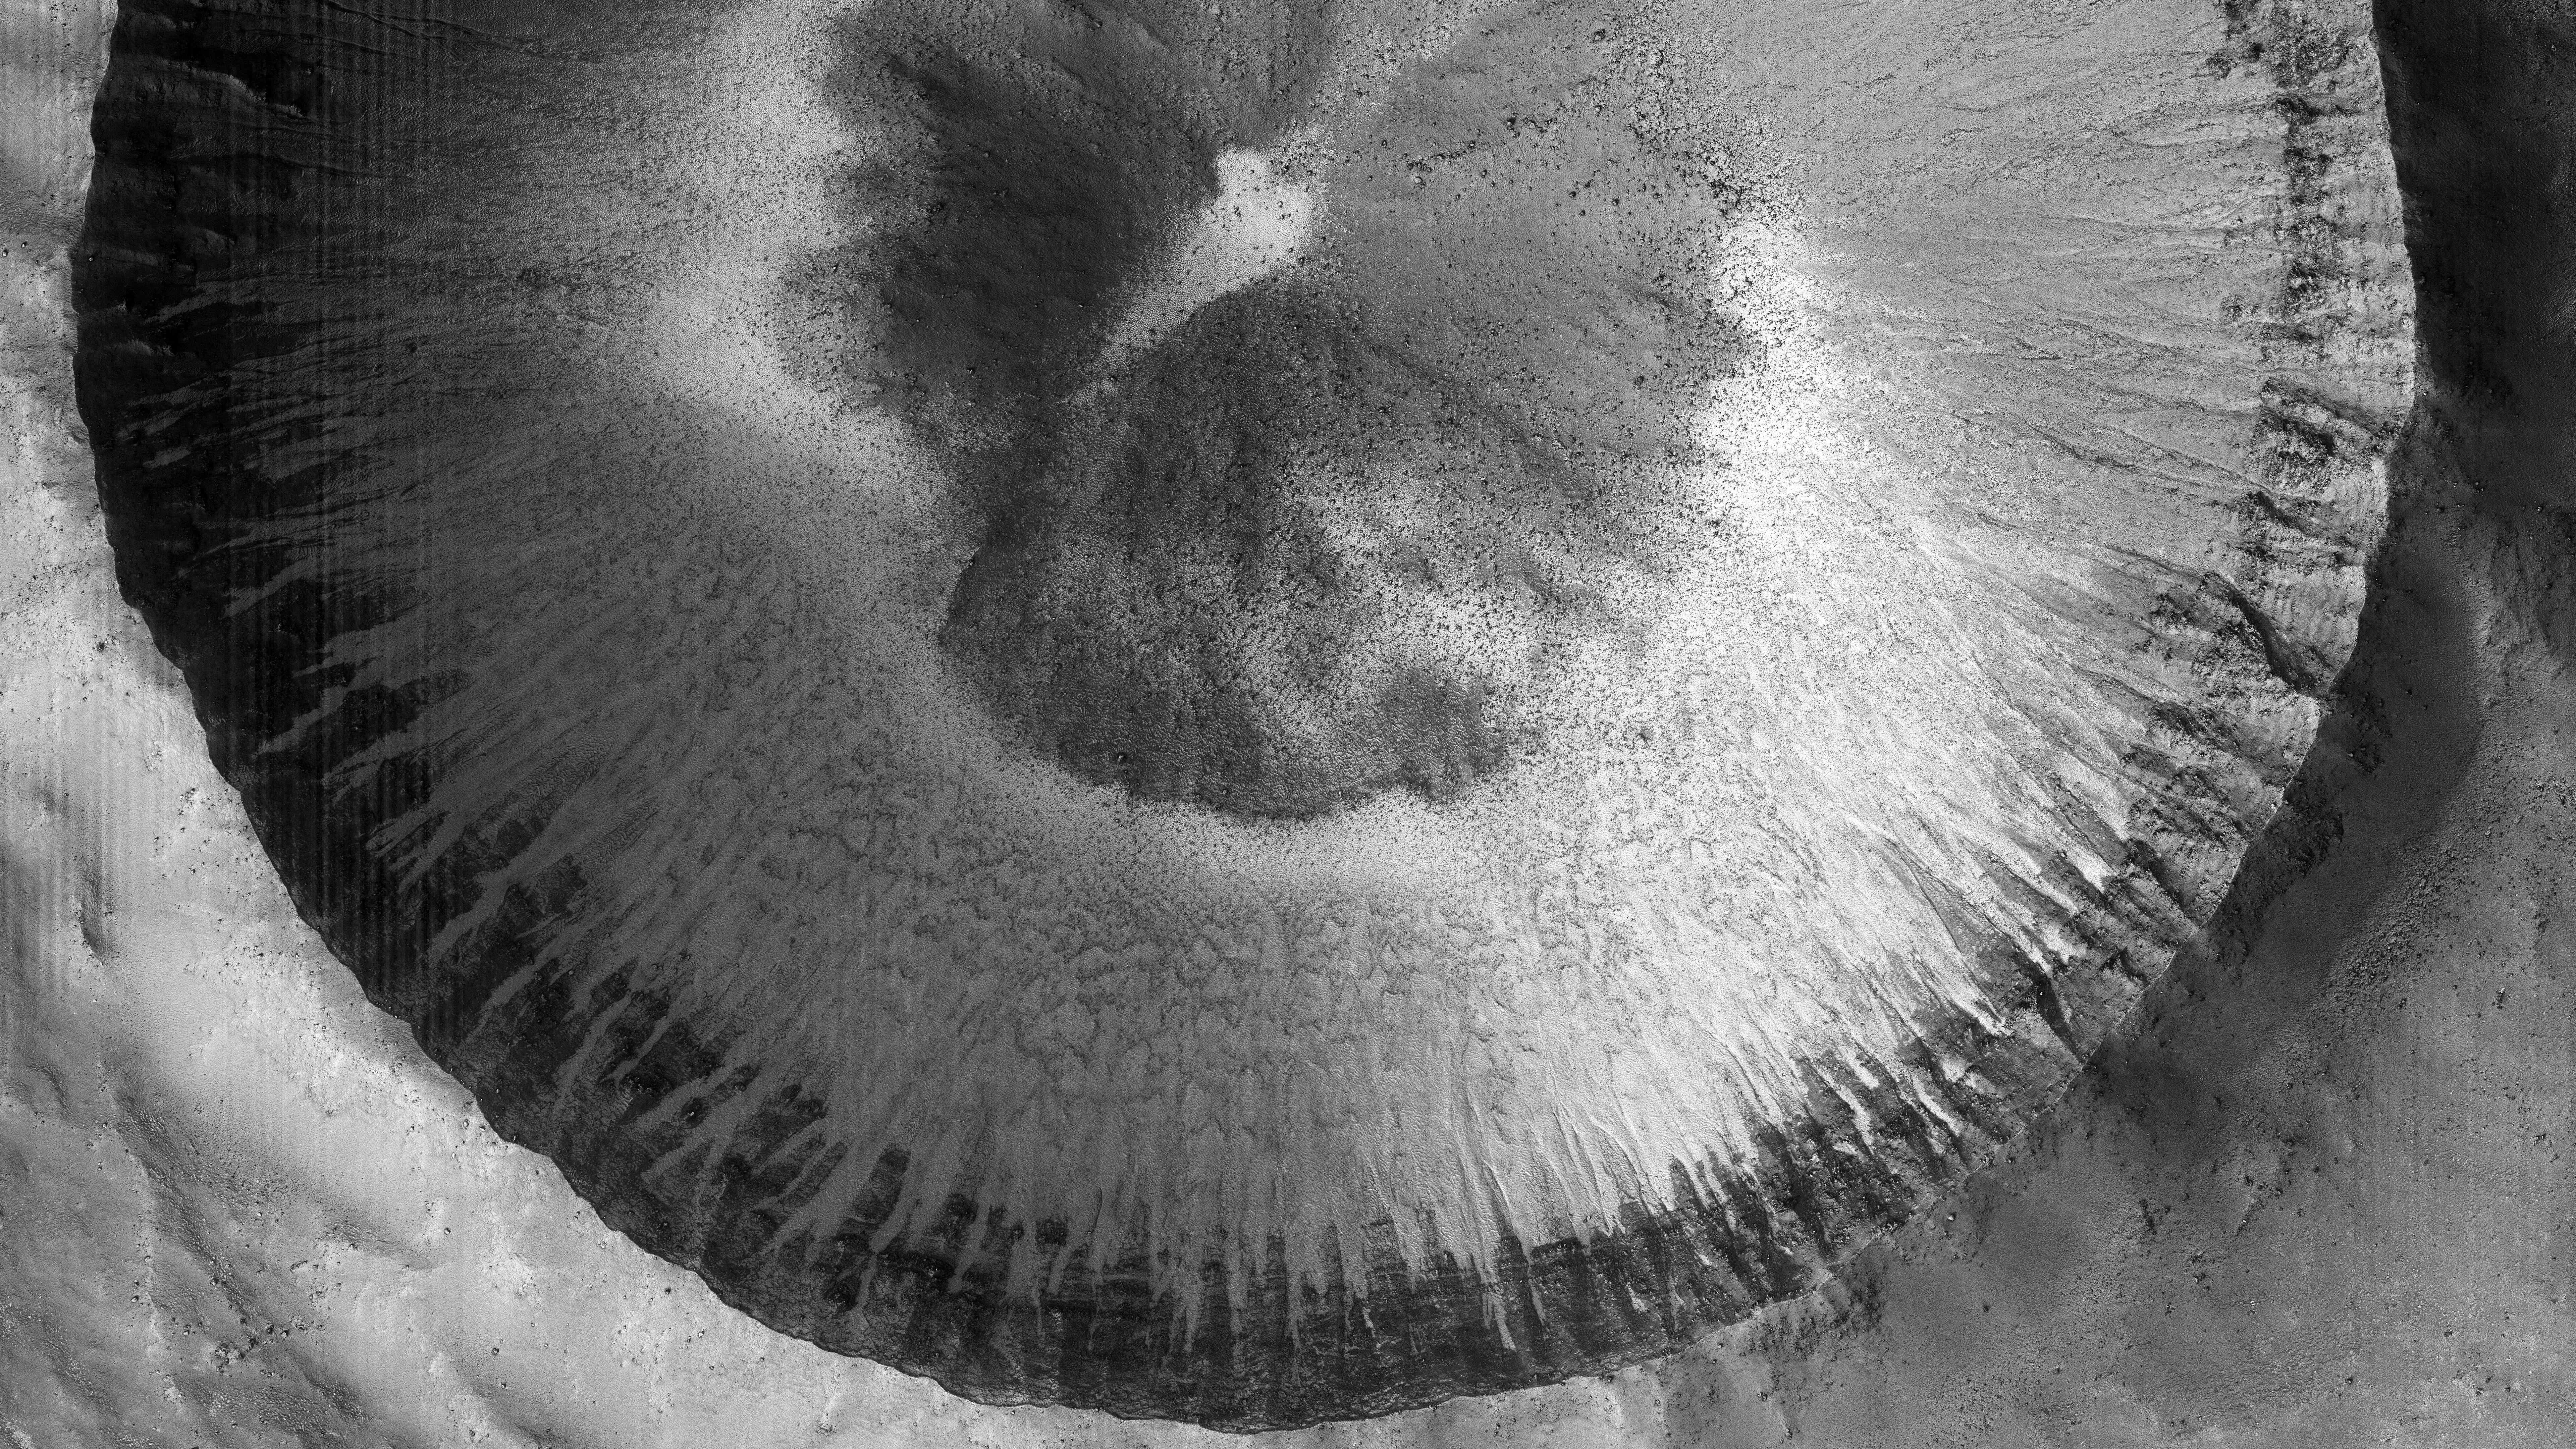 Planeta Marte. 5 NOI Imagini care au ULUIT Intreaga OMENIRE foto cratere mici